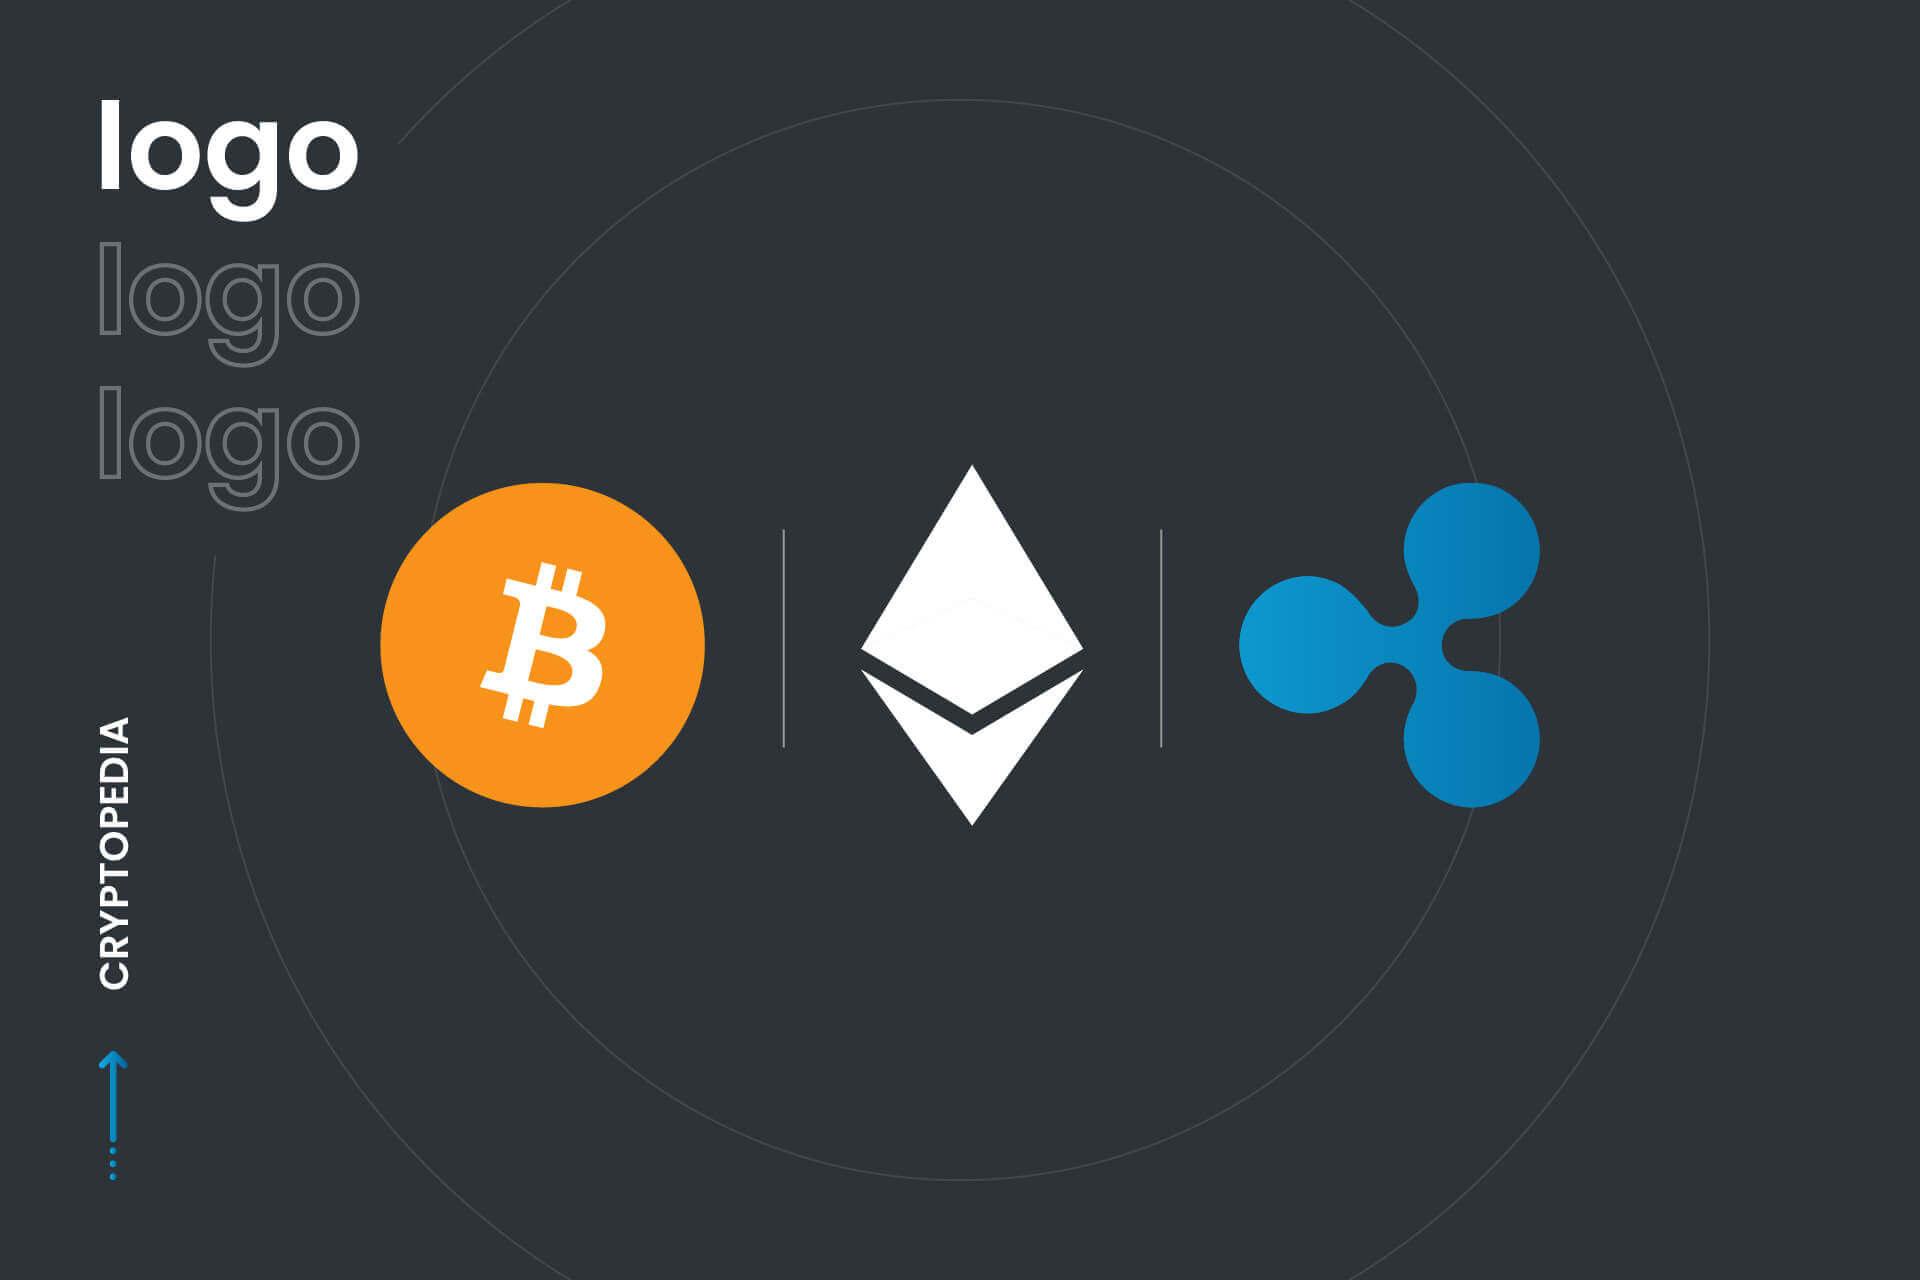 bitcoin-ethereum-ripple-logo